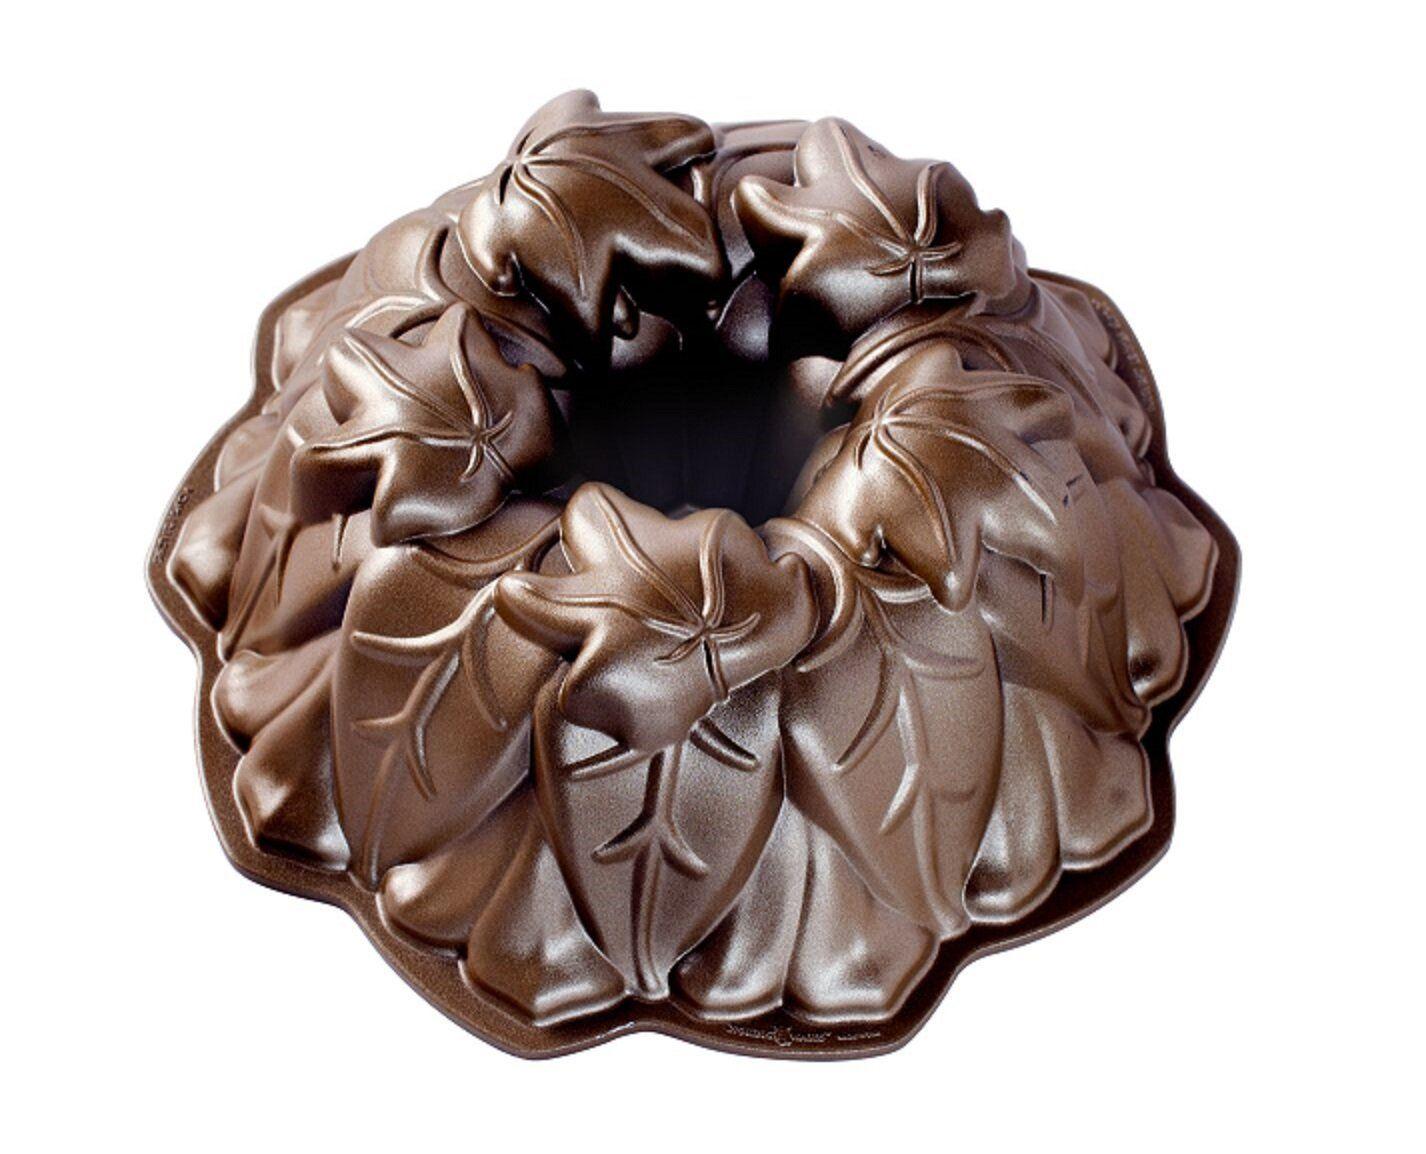 Nordic Ware Autumn Leaves Bundt Pan Bronze Collection